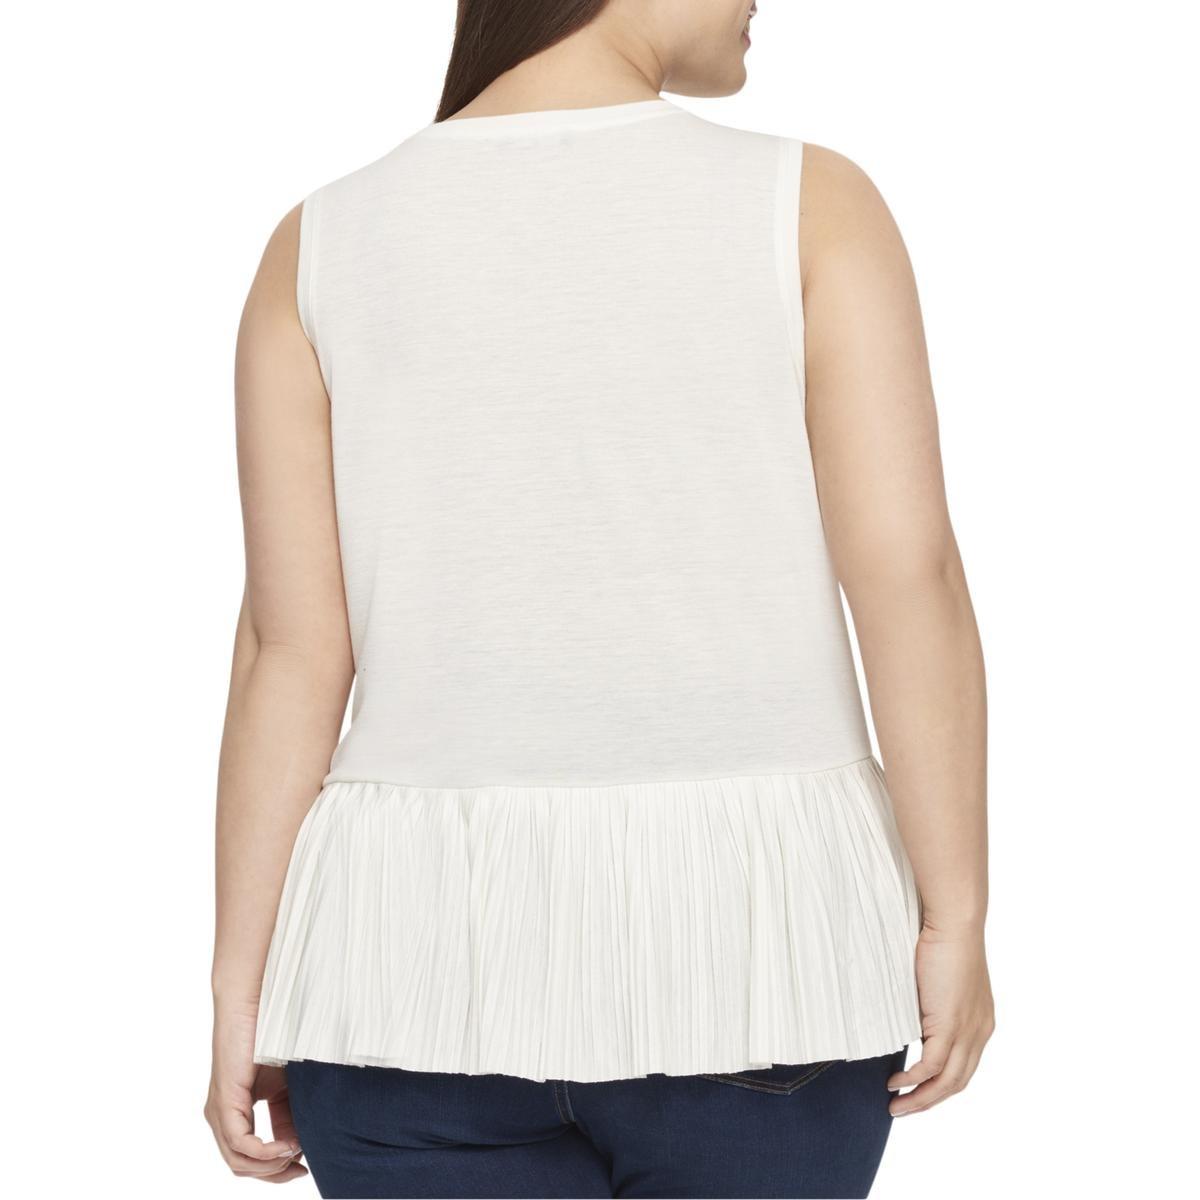 a4ab1b98dcd Tommy Hilfiger Plus Size Pleated Peplum-Hem Top (1X) at Amazon Women s  Clothing store